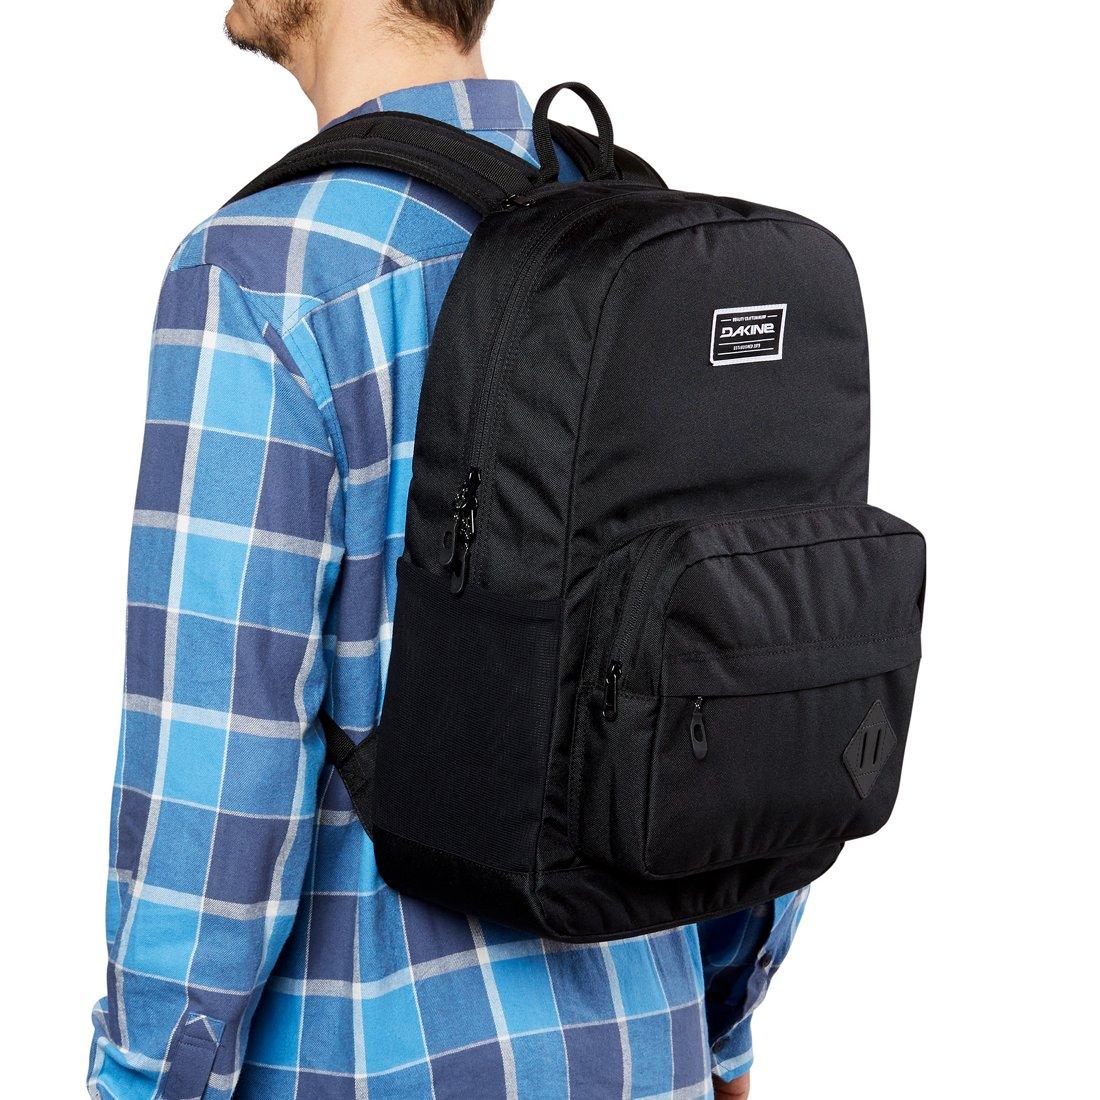 b8de2eb01f168 Dakine Packs   Bags 365 Pack Rucksack 46 cm - koffer-direkt.de